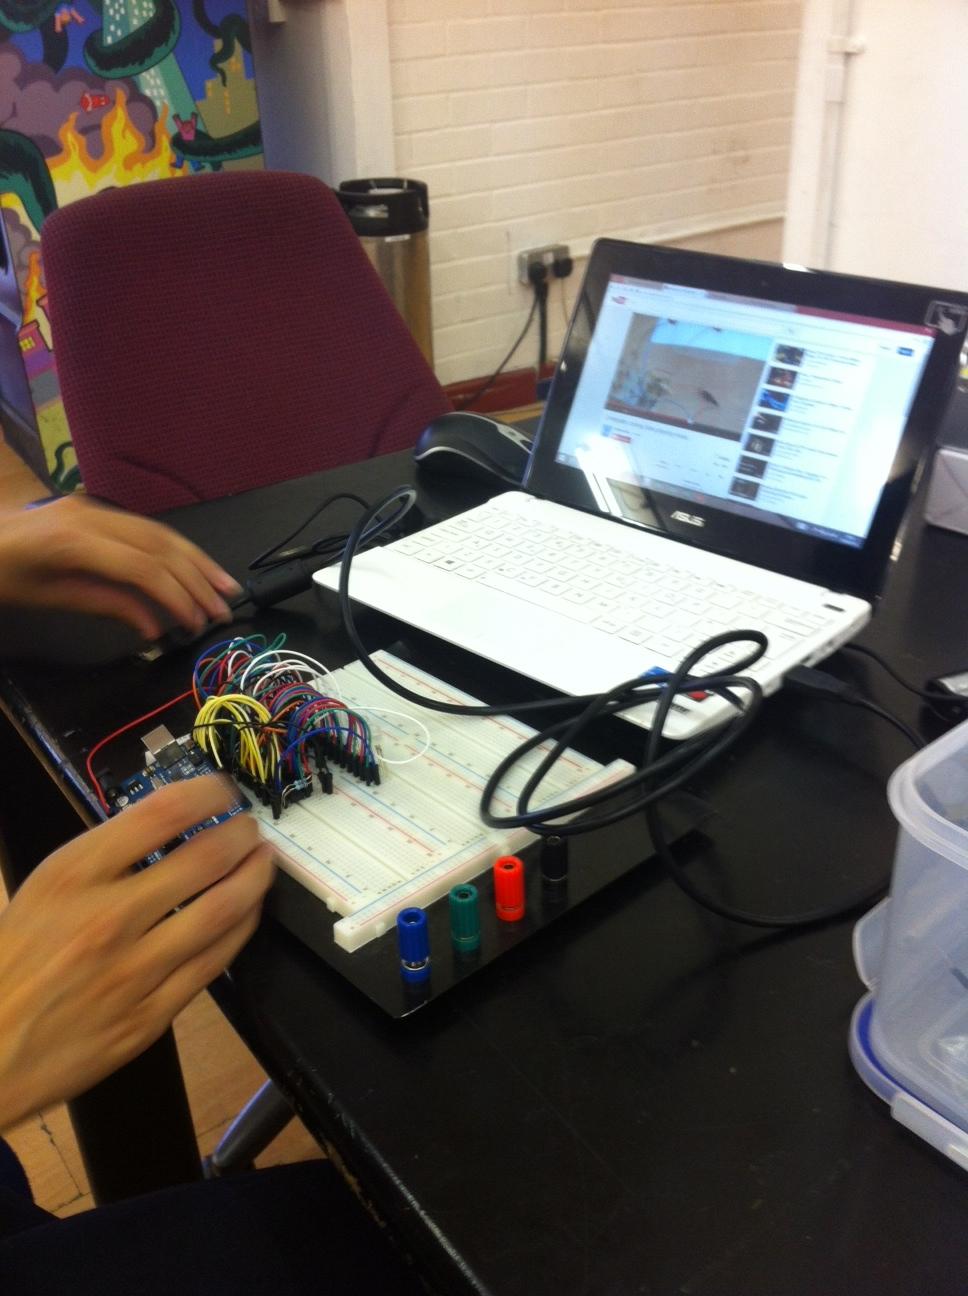 Learn - program an Arduino